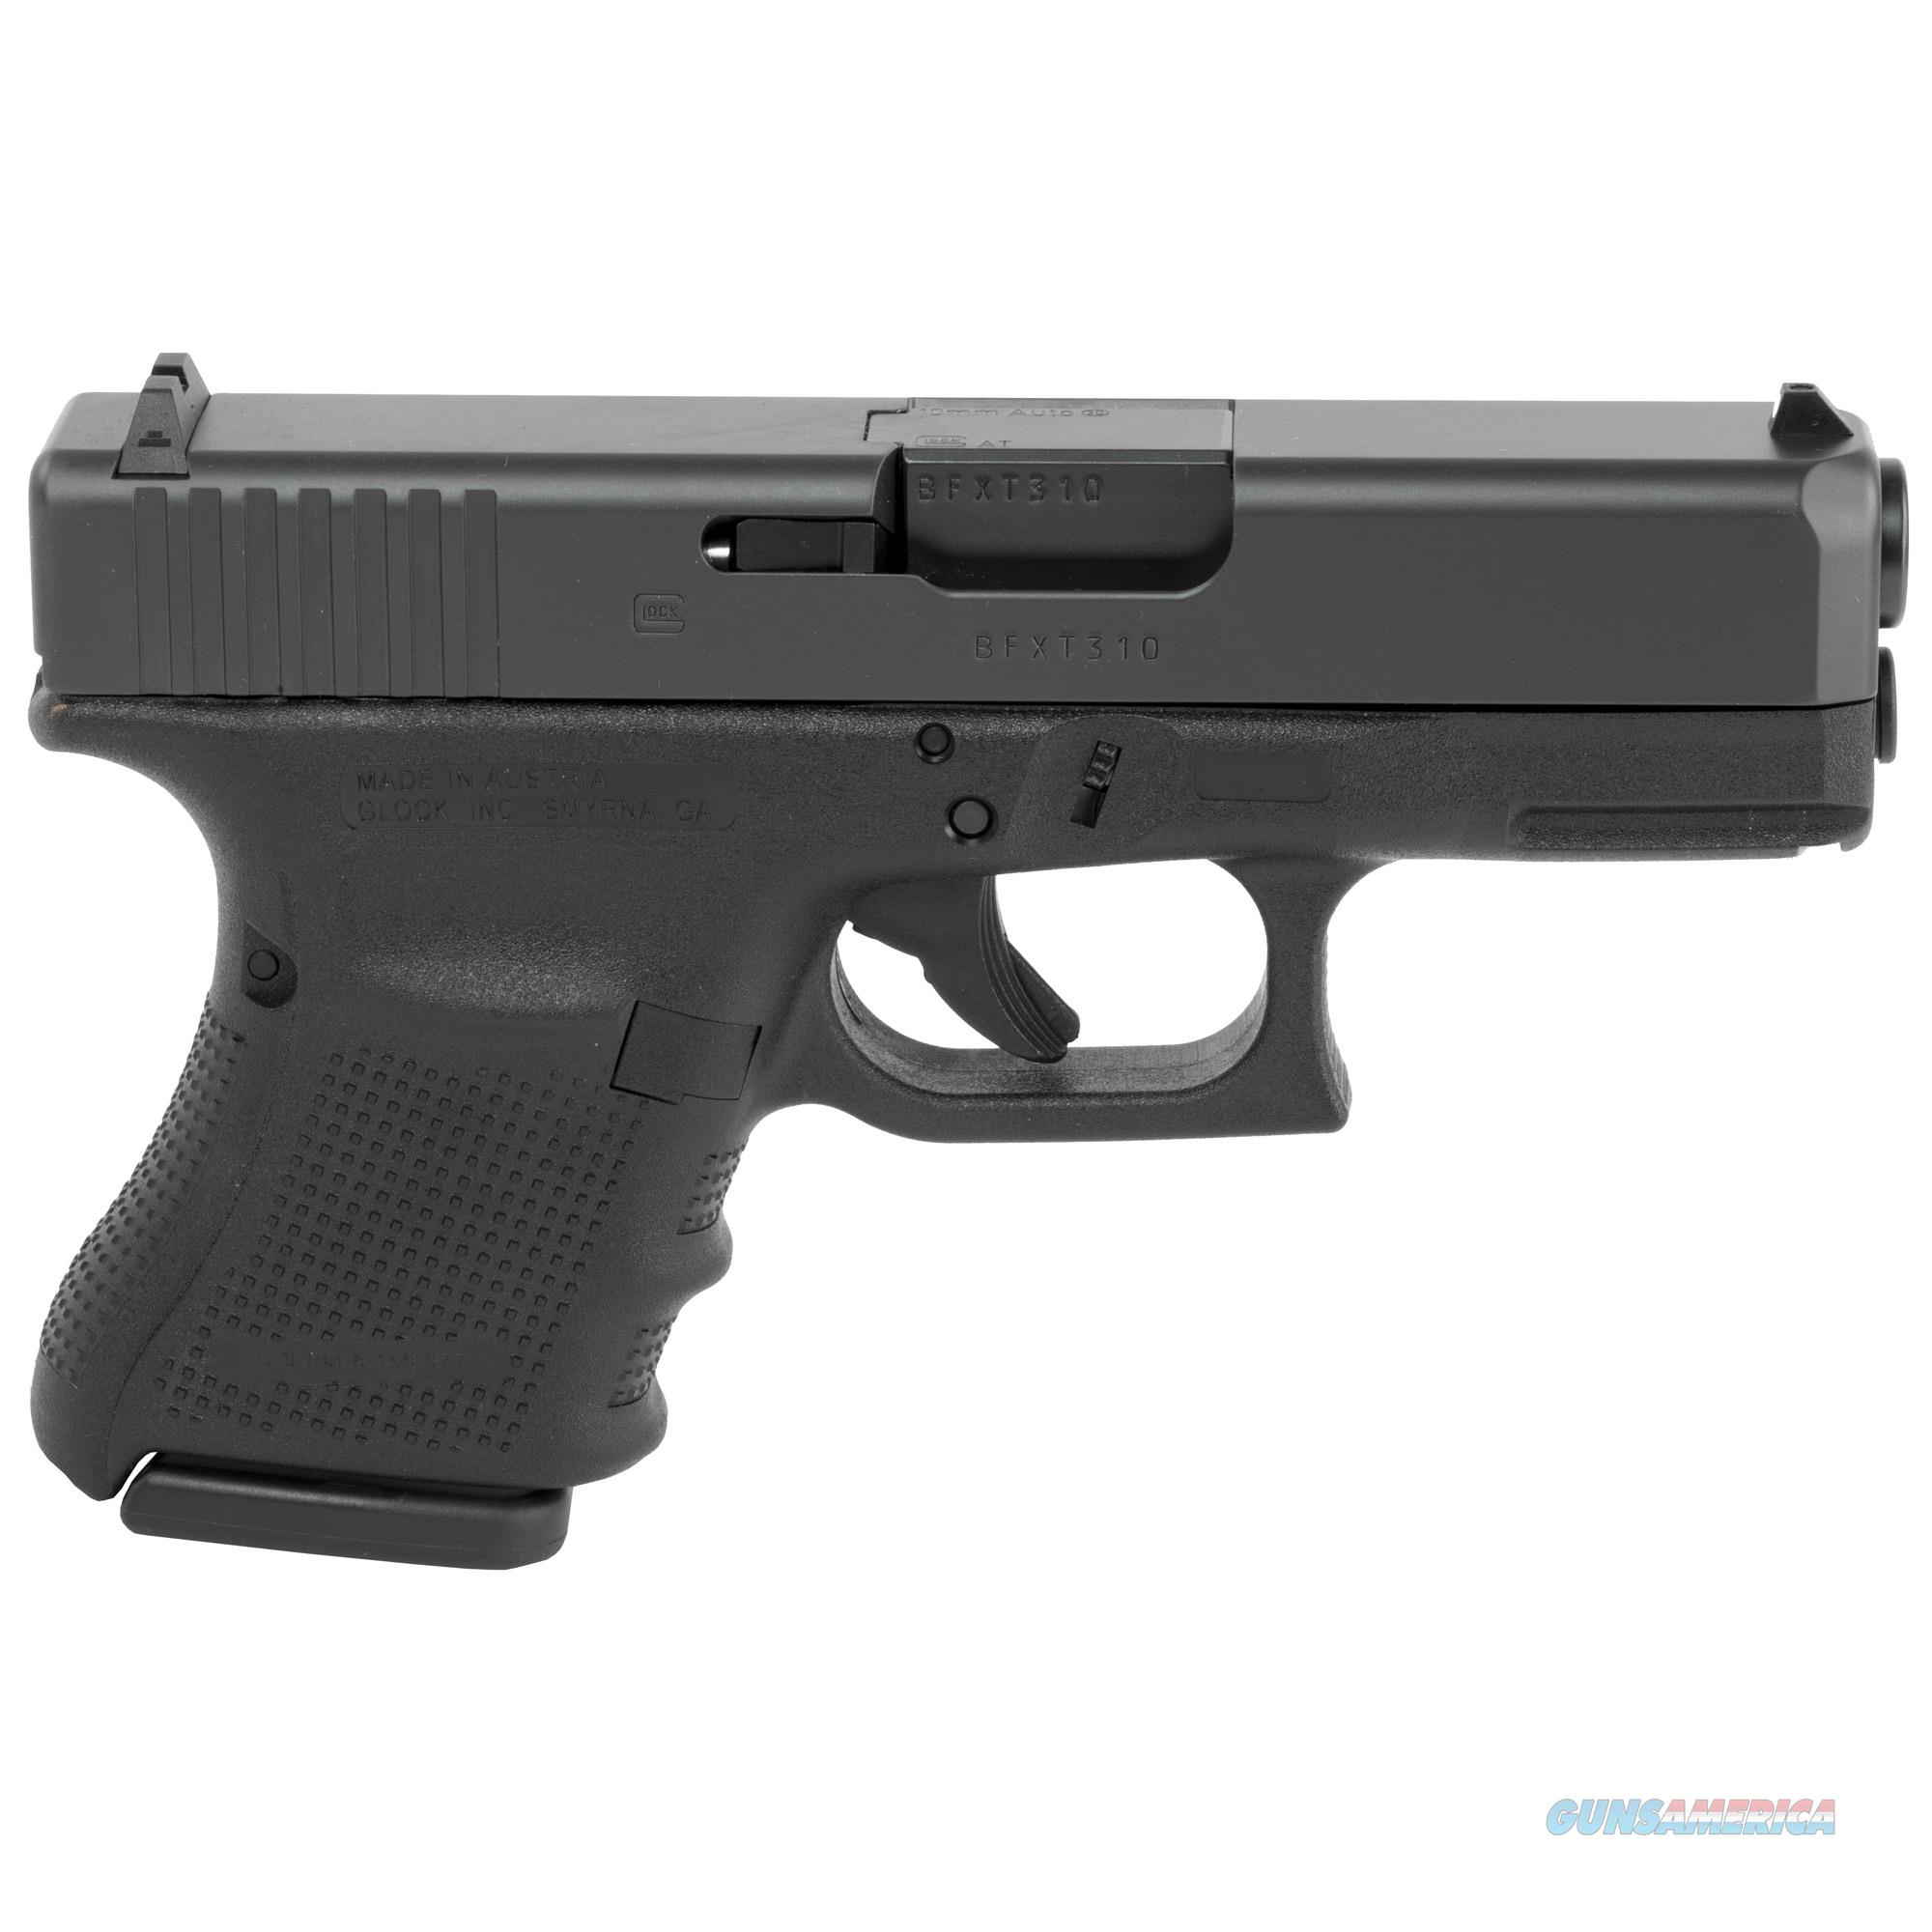 Glock 29 Gen 4 PG-29502-01 10mm 10+1 cap w/3 mags $579 NIB  Guns > Pistols > Glock Pistols > 29/30/36